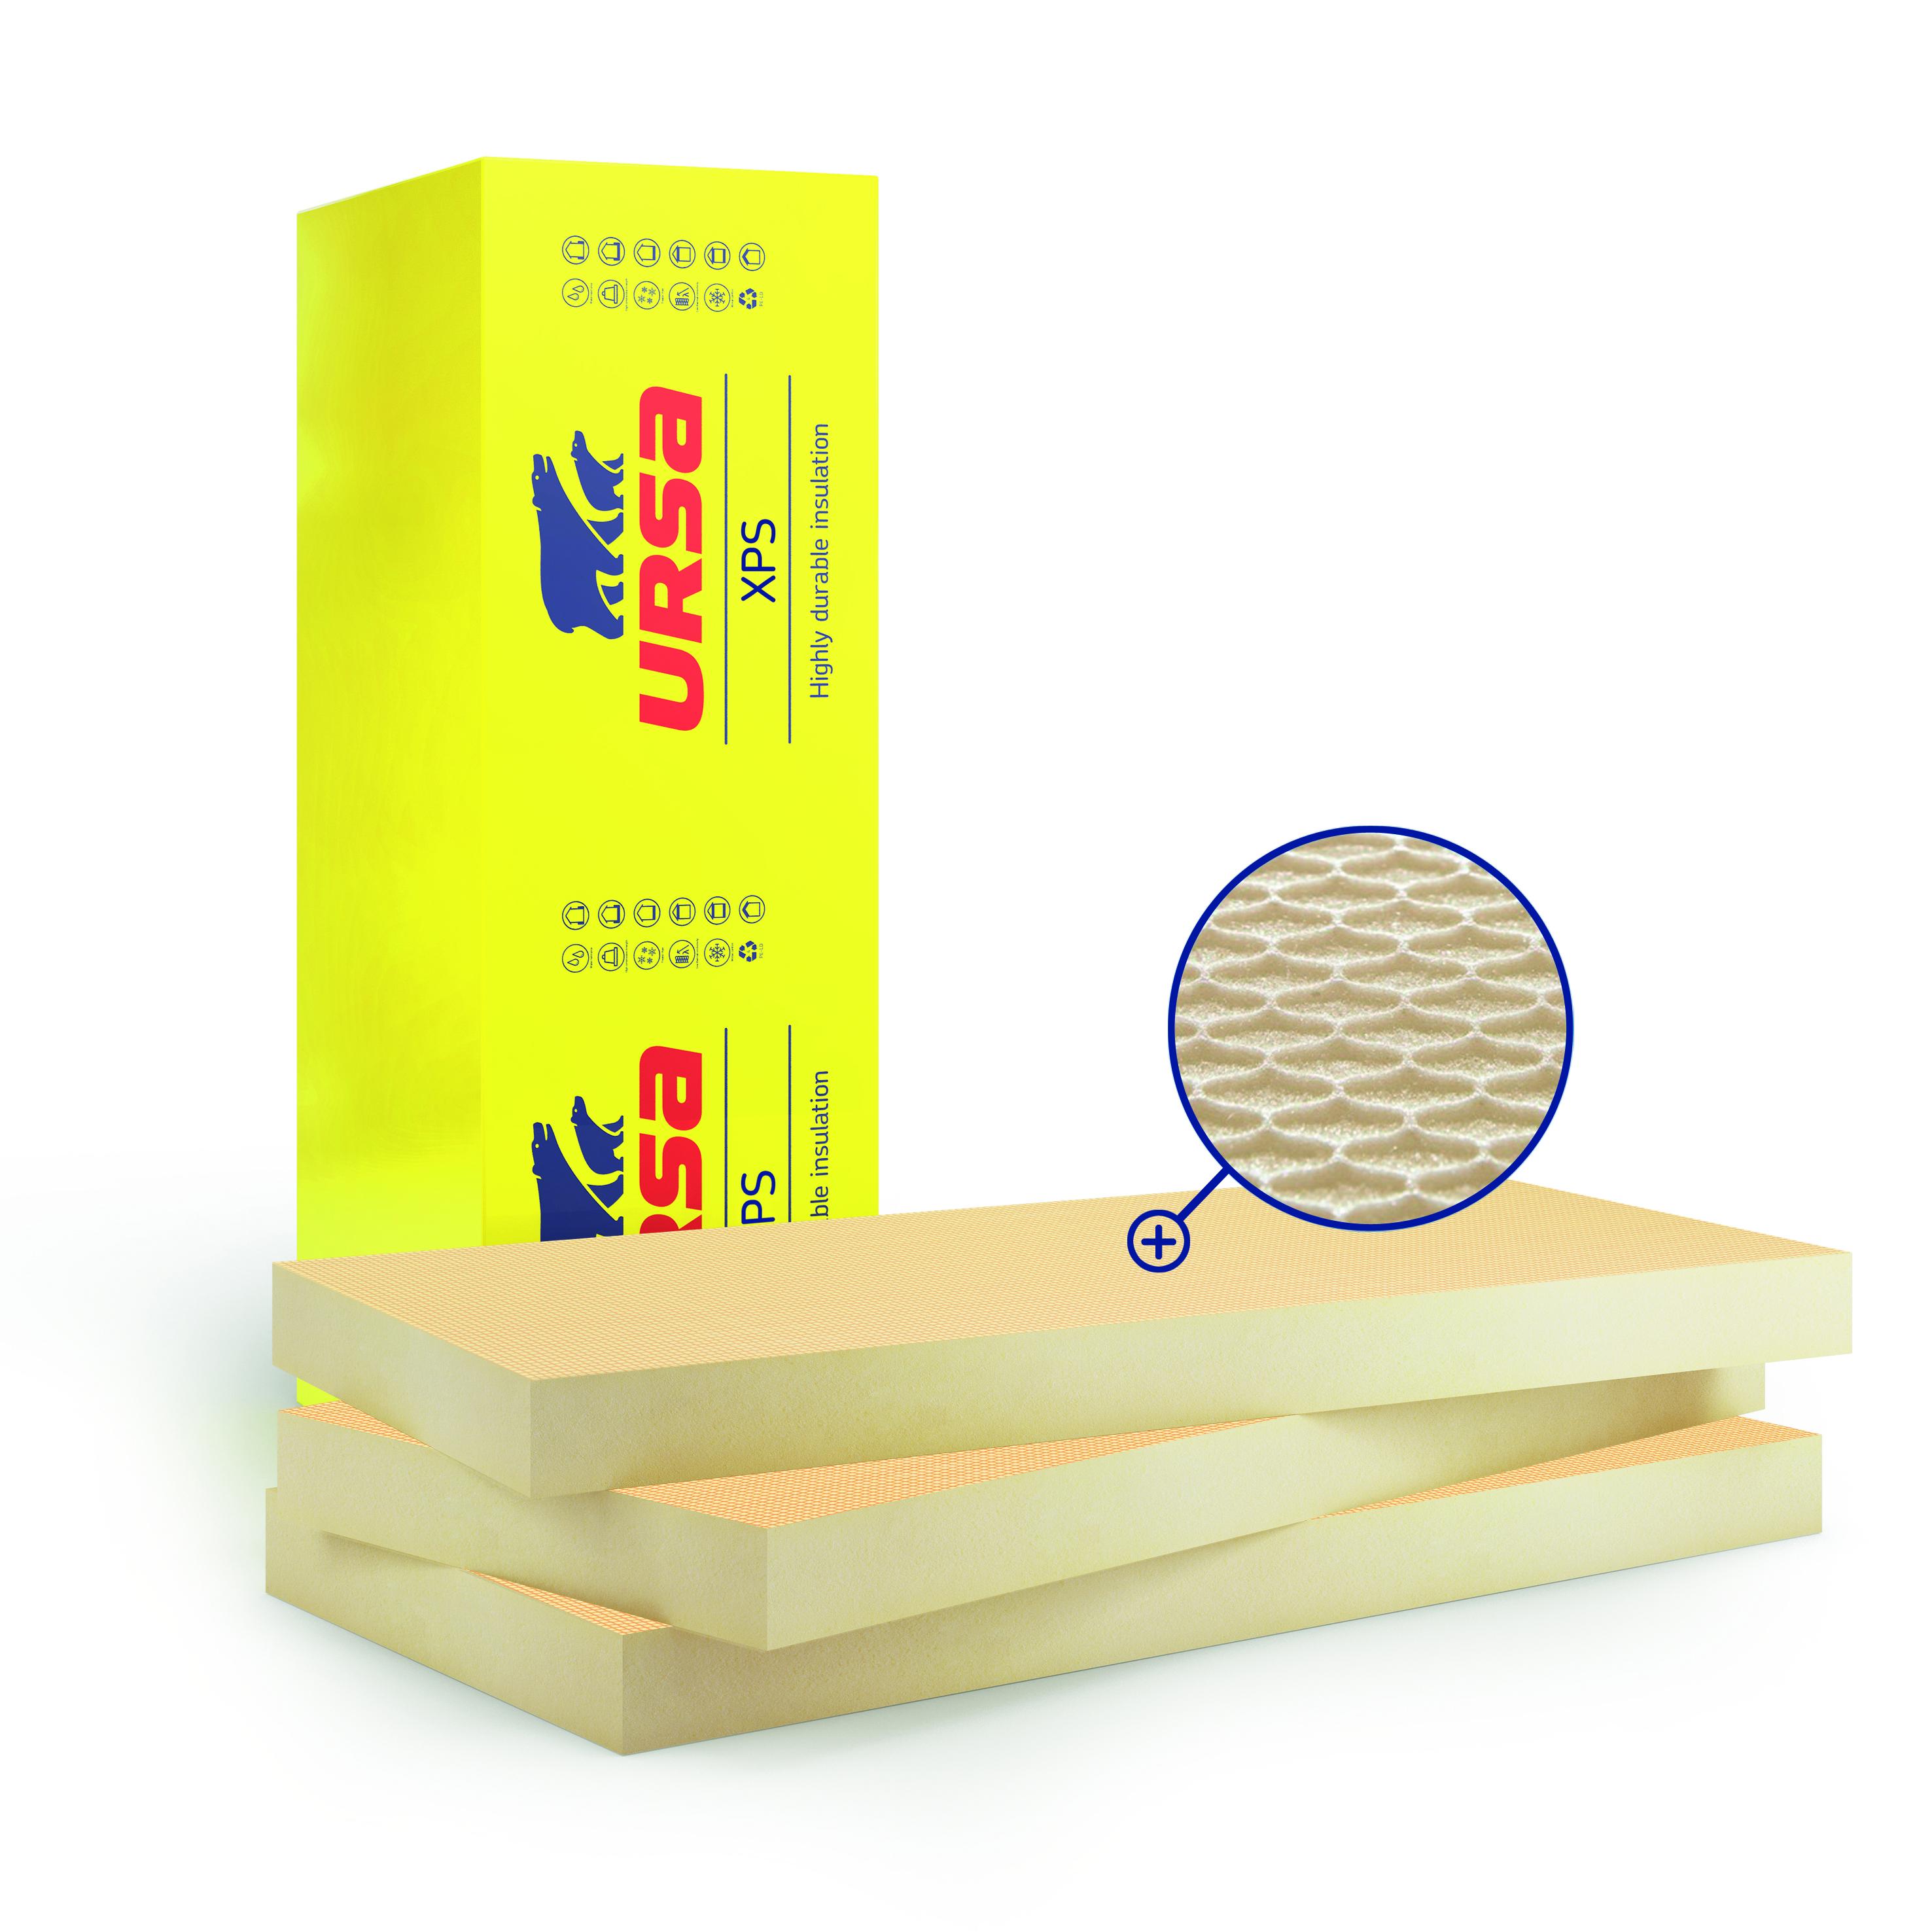 ursa-plus-1520854521.jpg